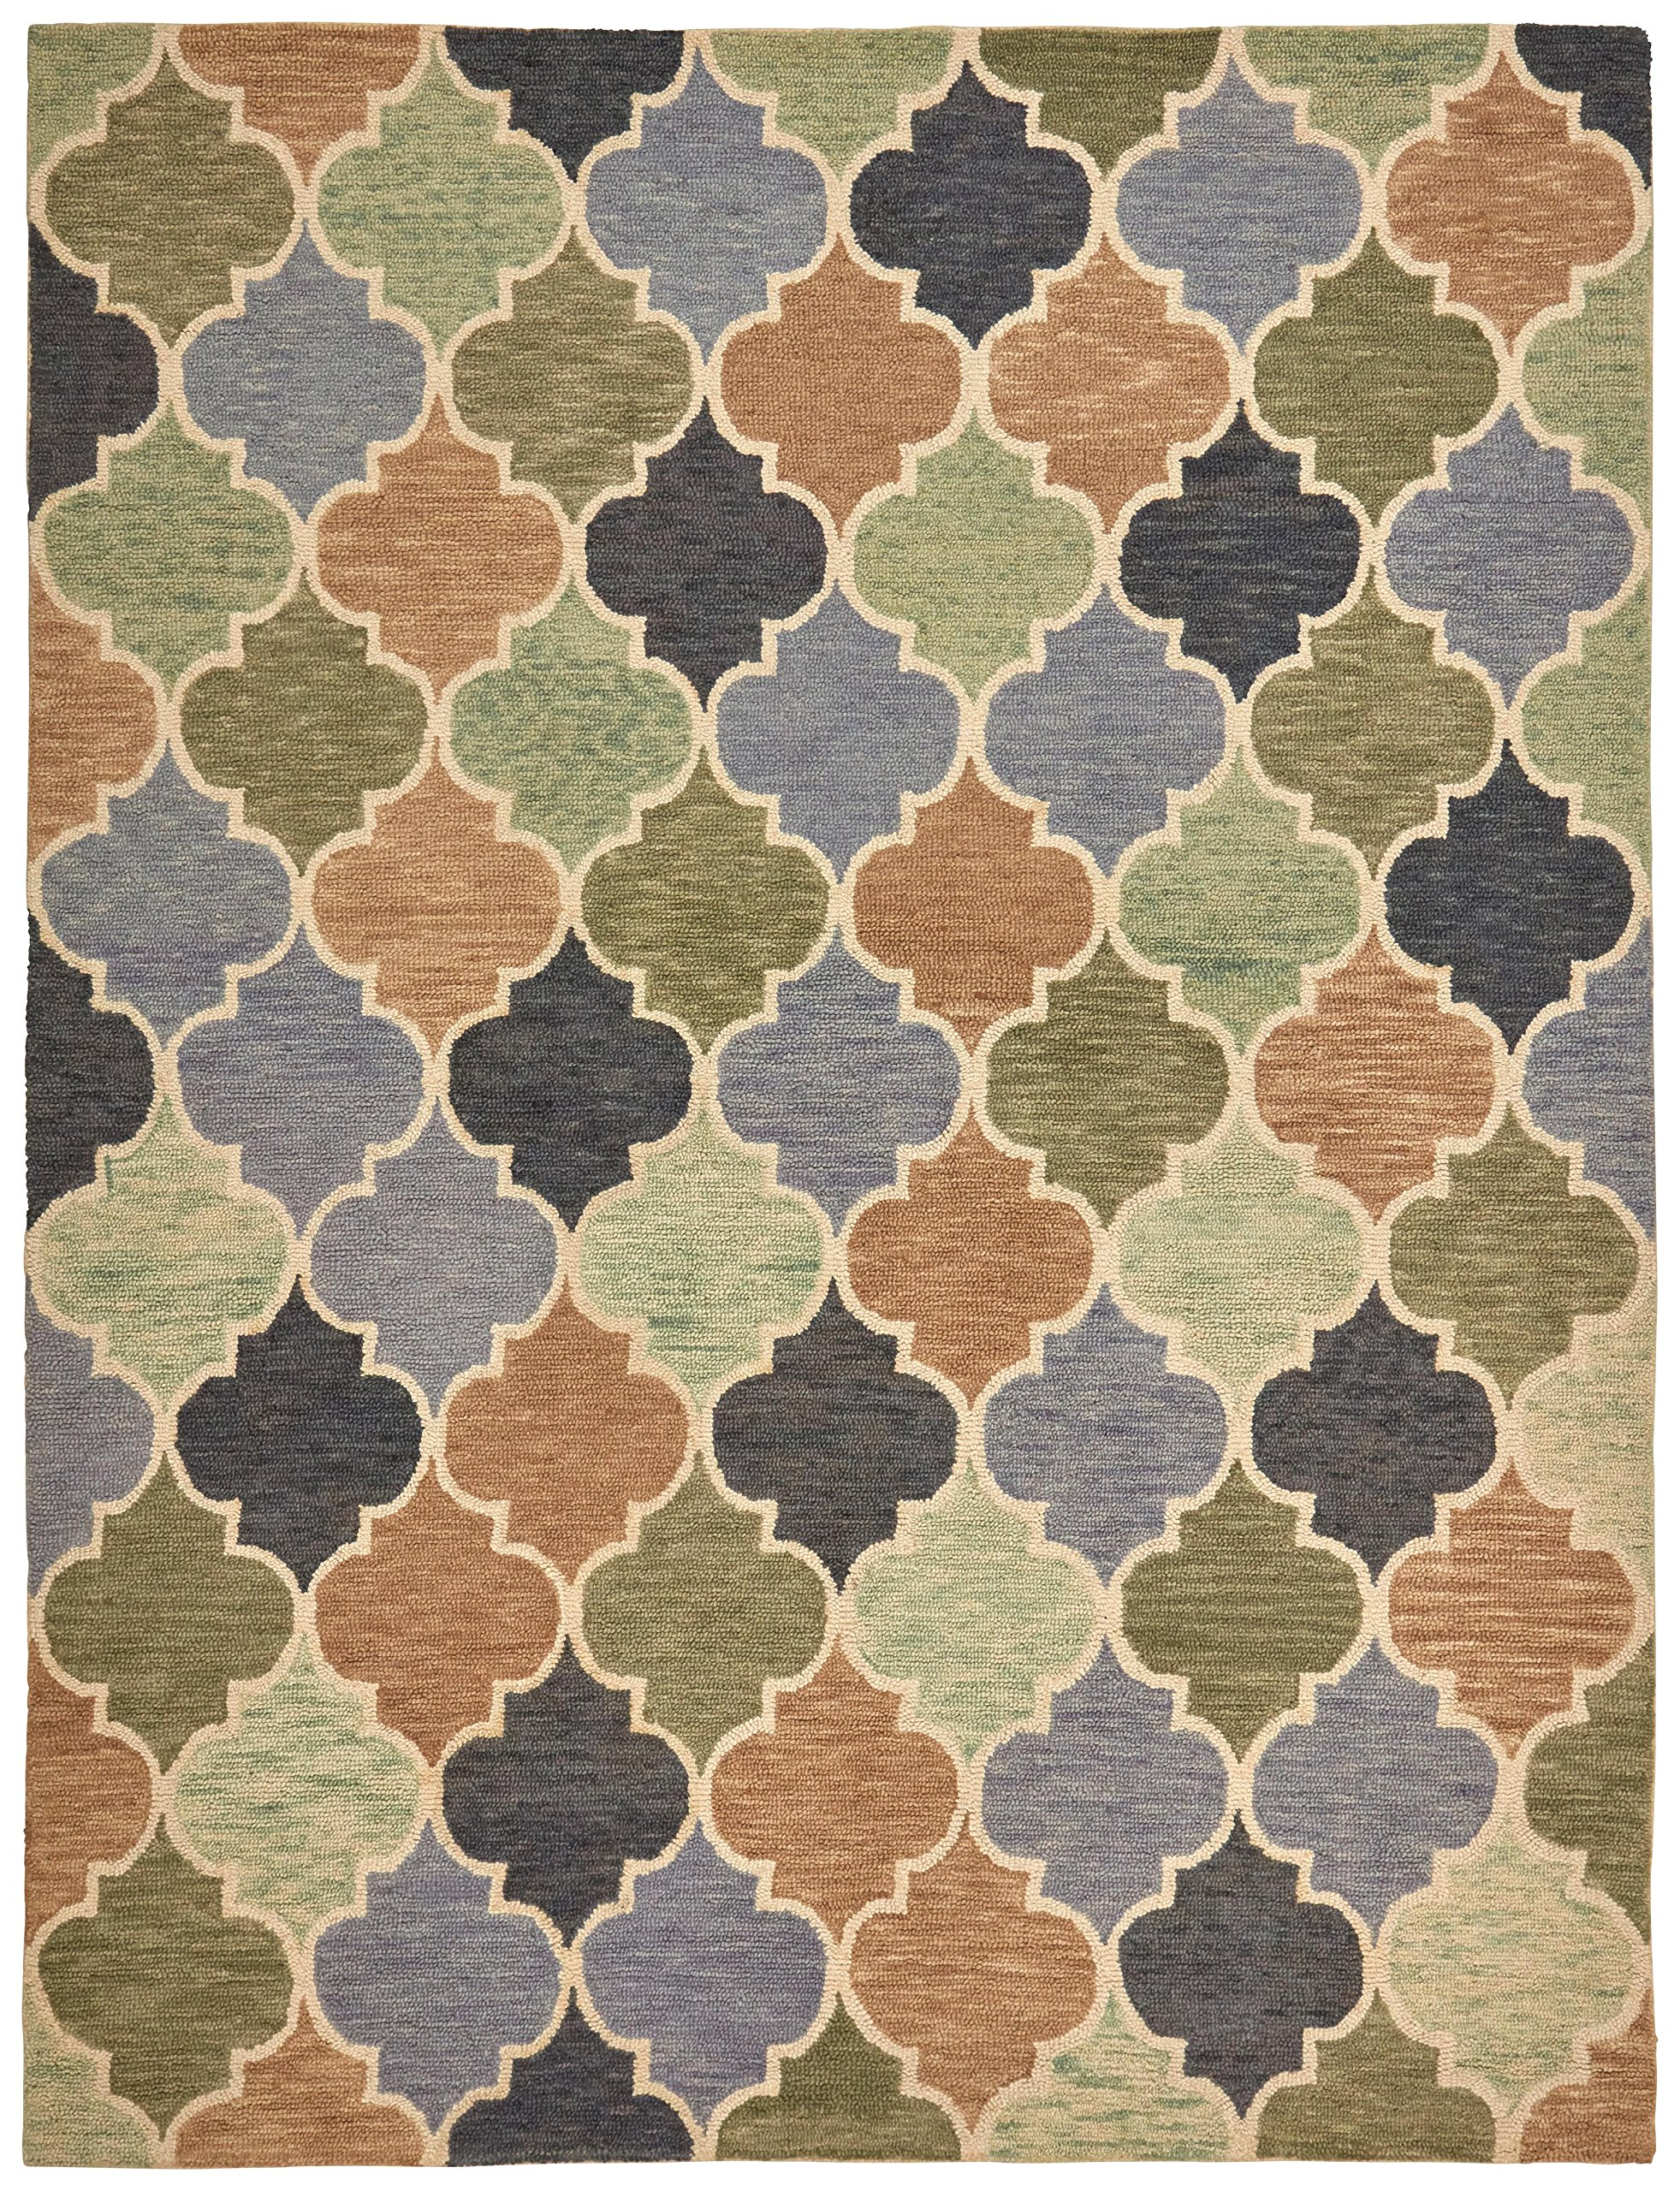 Stone & Beam Quarterfoil Wool Area Rug, 4' x 6', Light Multi